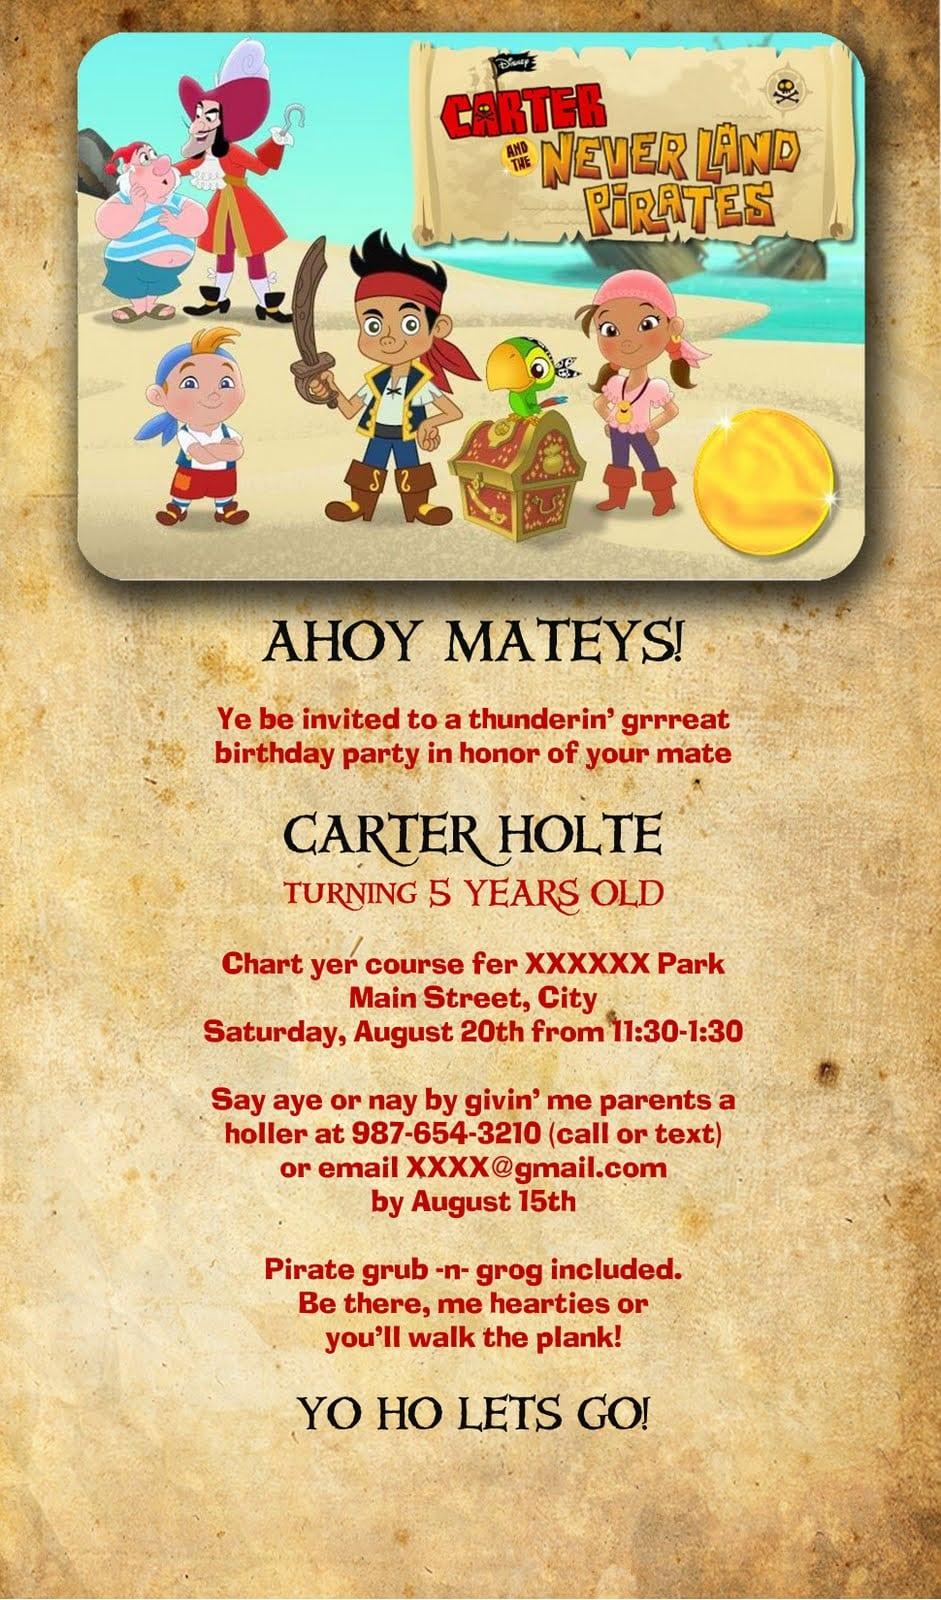 Princess Pirate Party Invitation Template